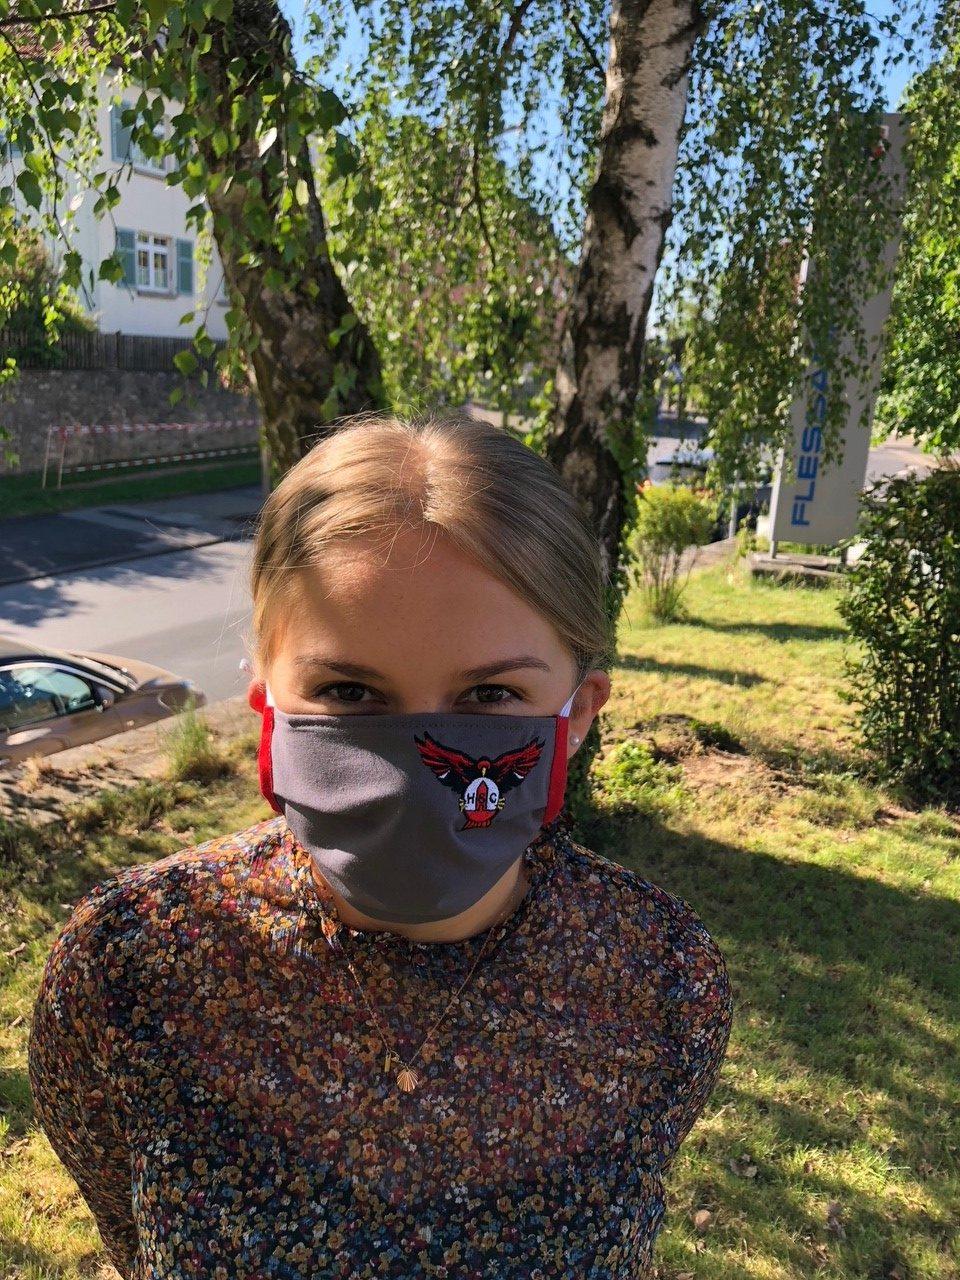 Rotmilan-Masken können bestellt werden